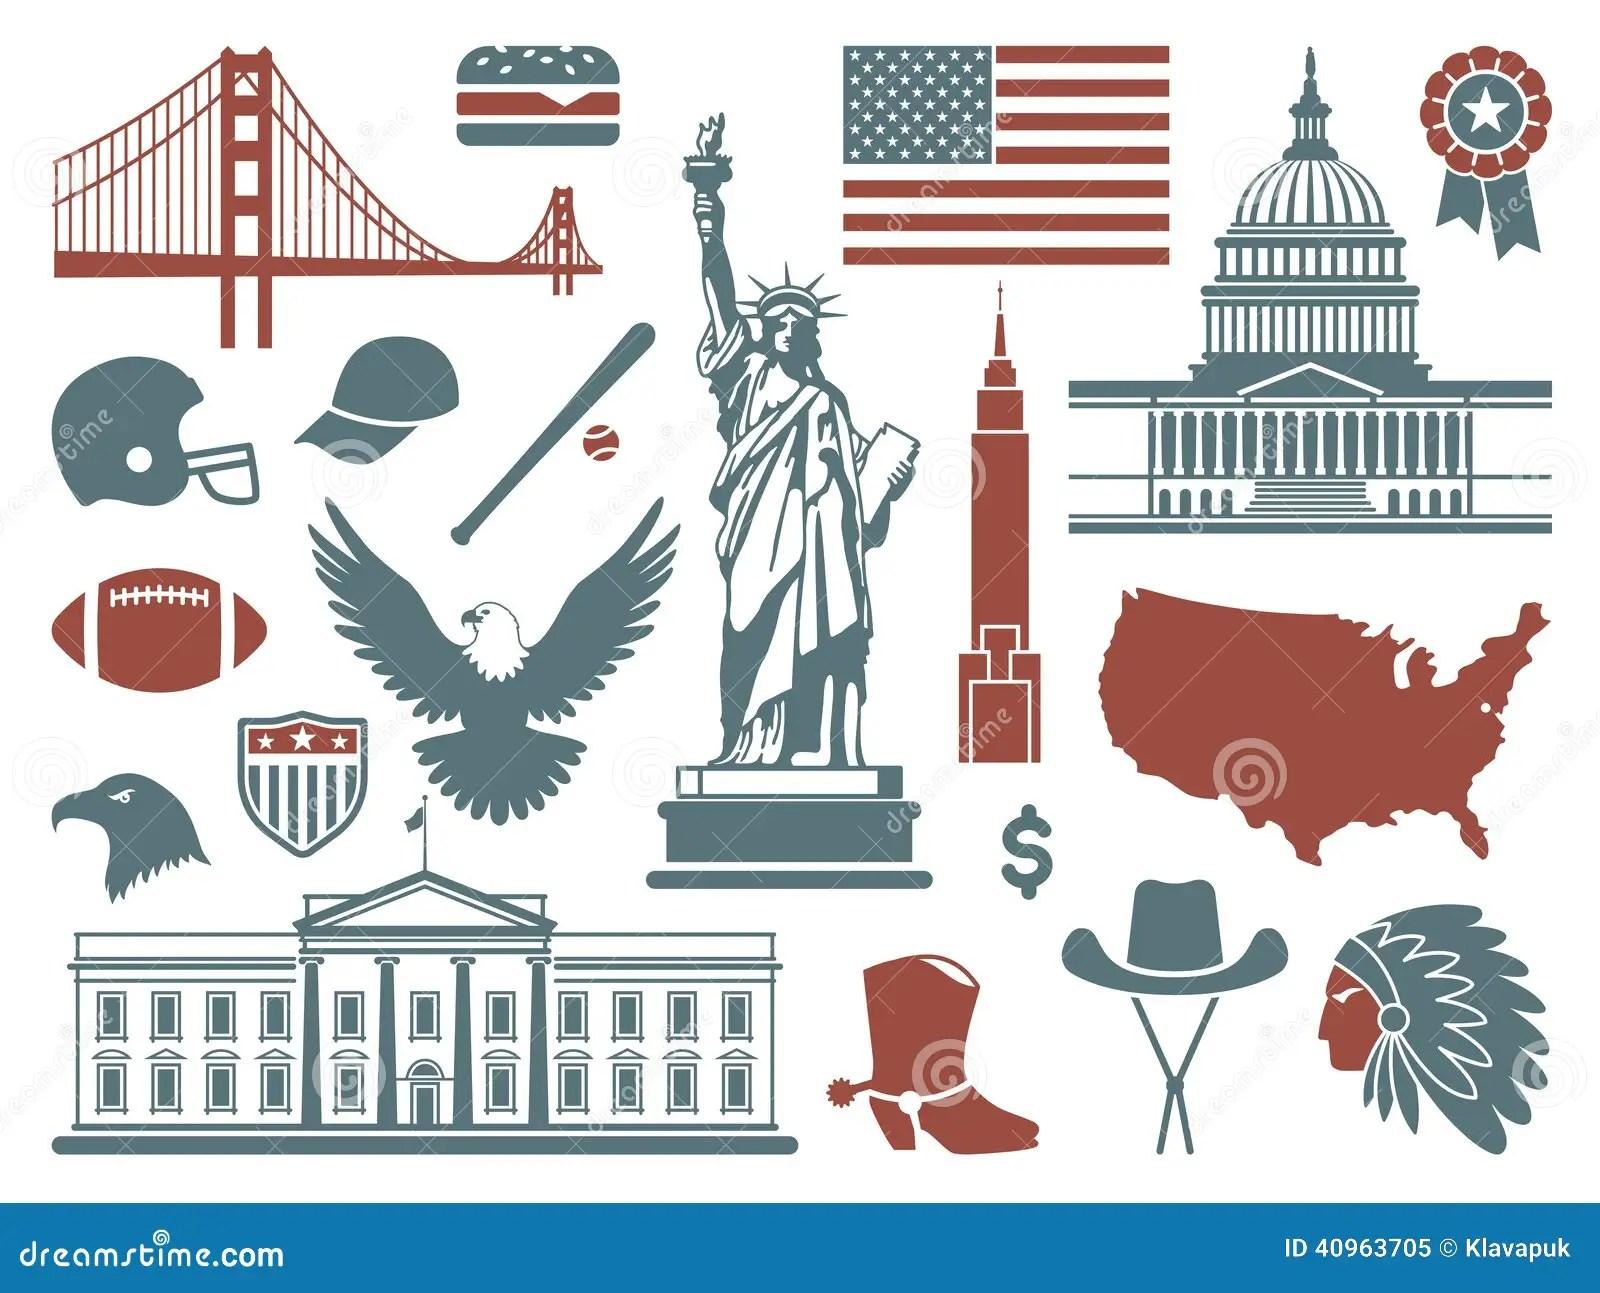 Symbols Of The Usa Stock Illustration Illustration Of